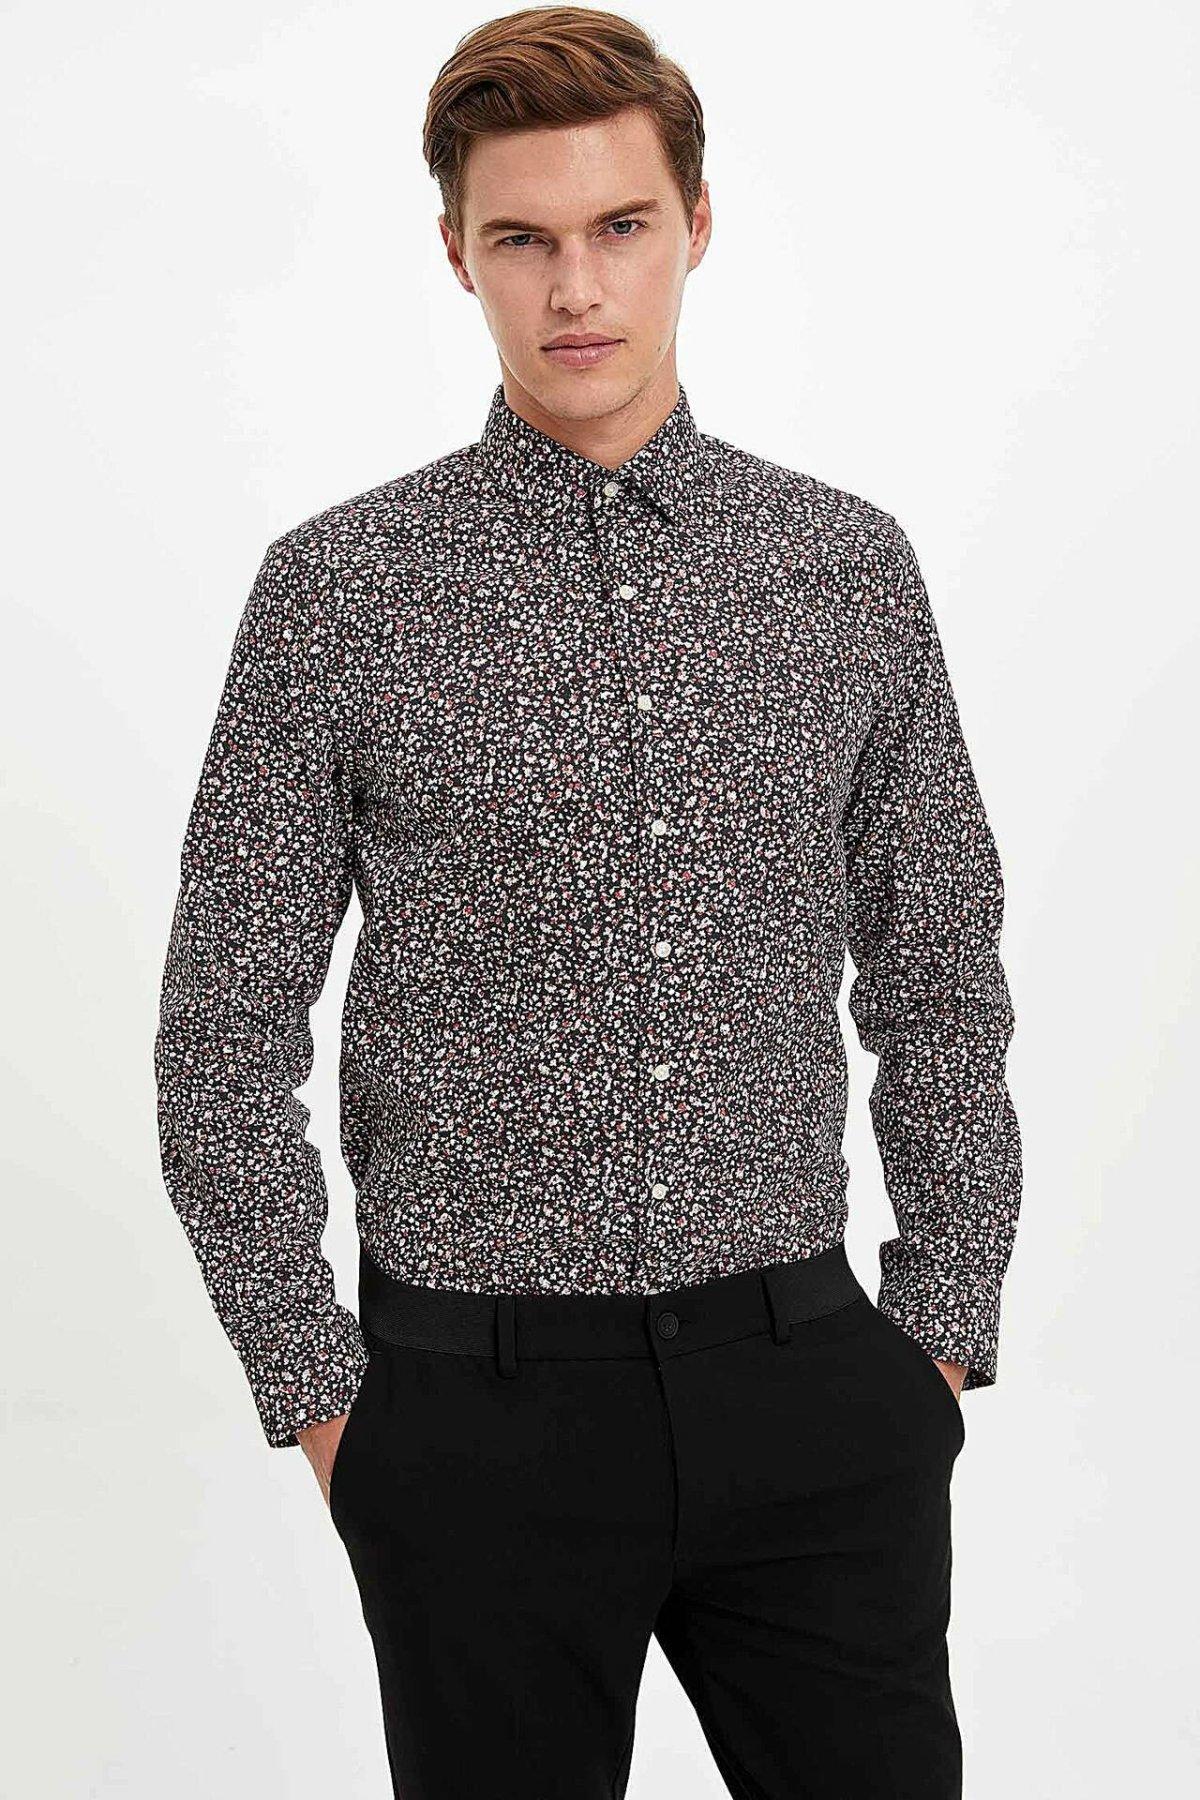 DeFacto Man Winter Stylish Prints Shirts Smart Casual Turn-down Collar Long Sleeve Shirt Men's Formal Tops Shirts-M2651AZ19WN